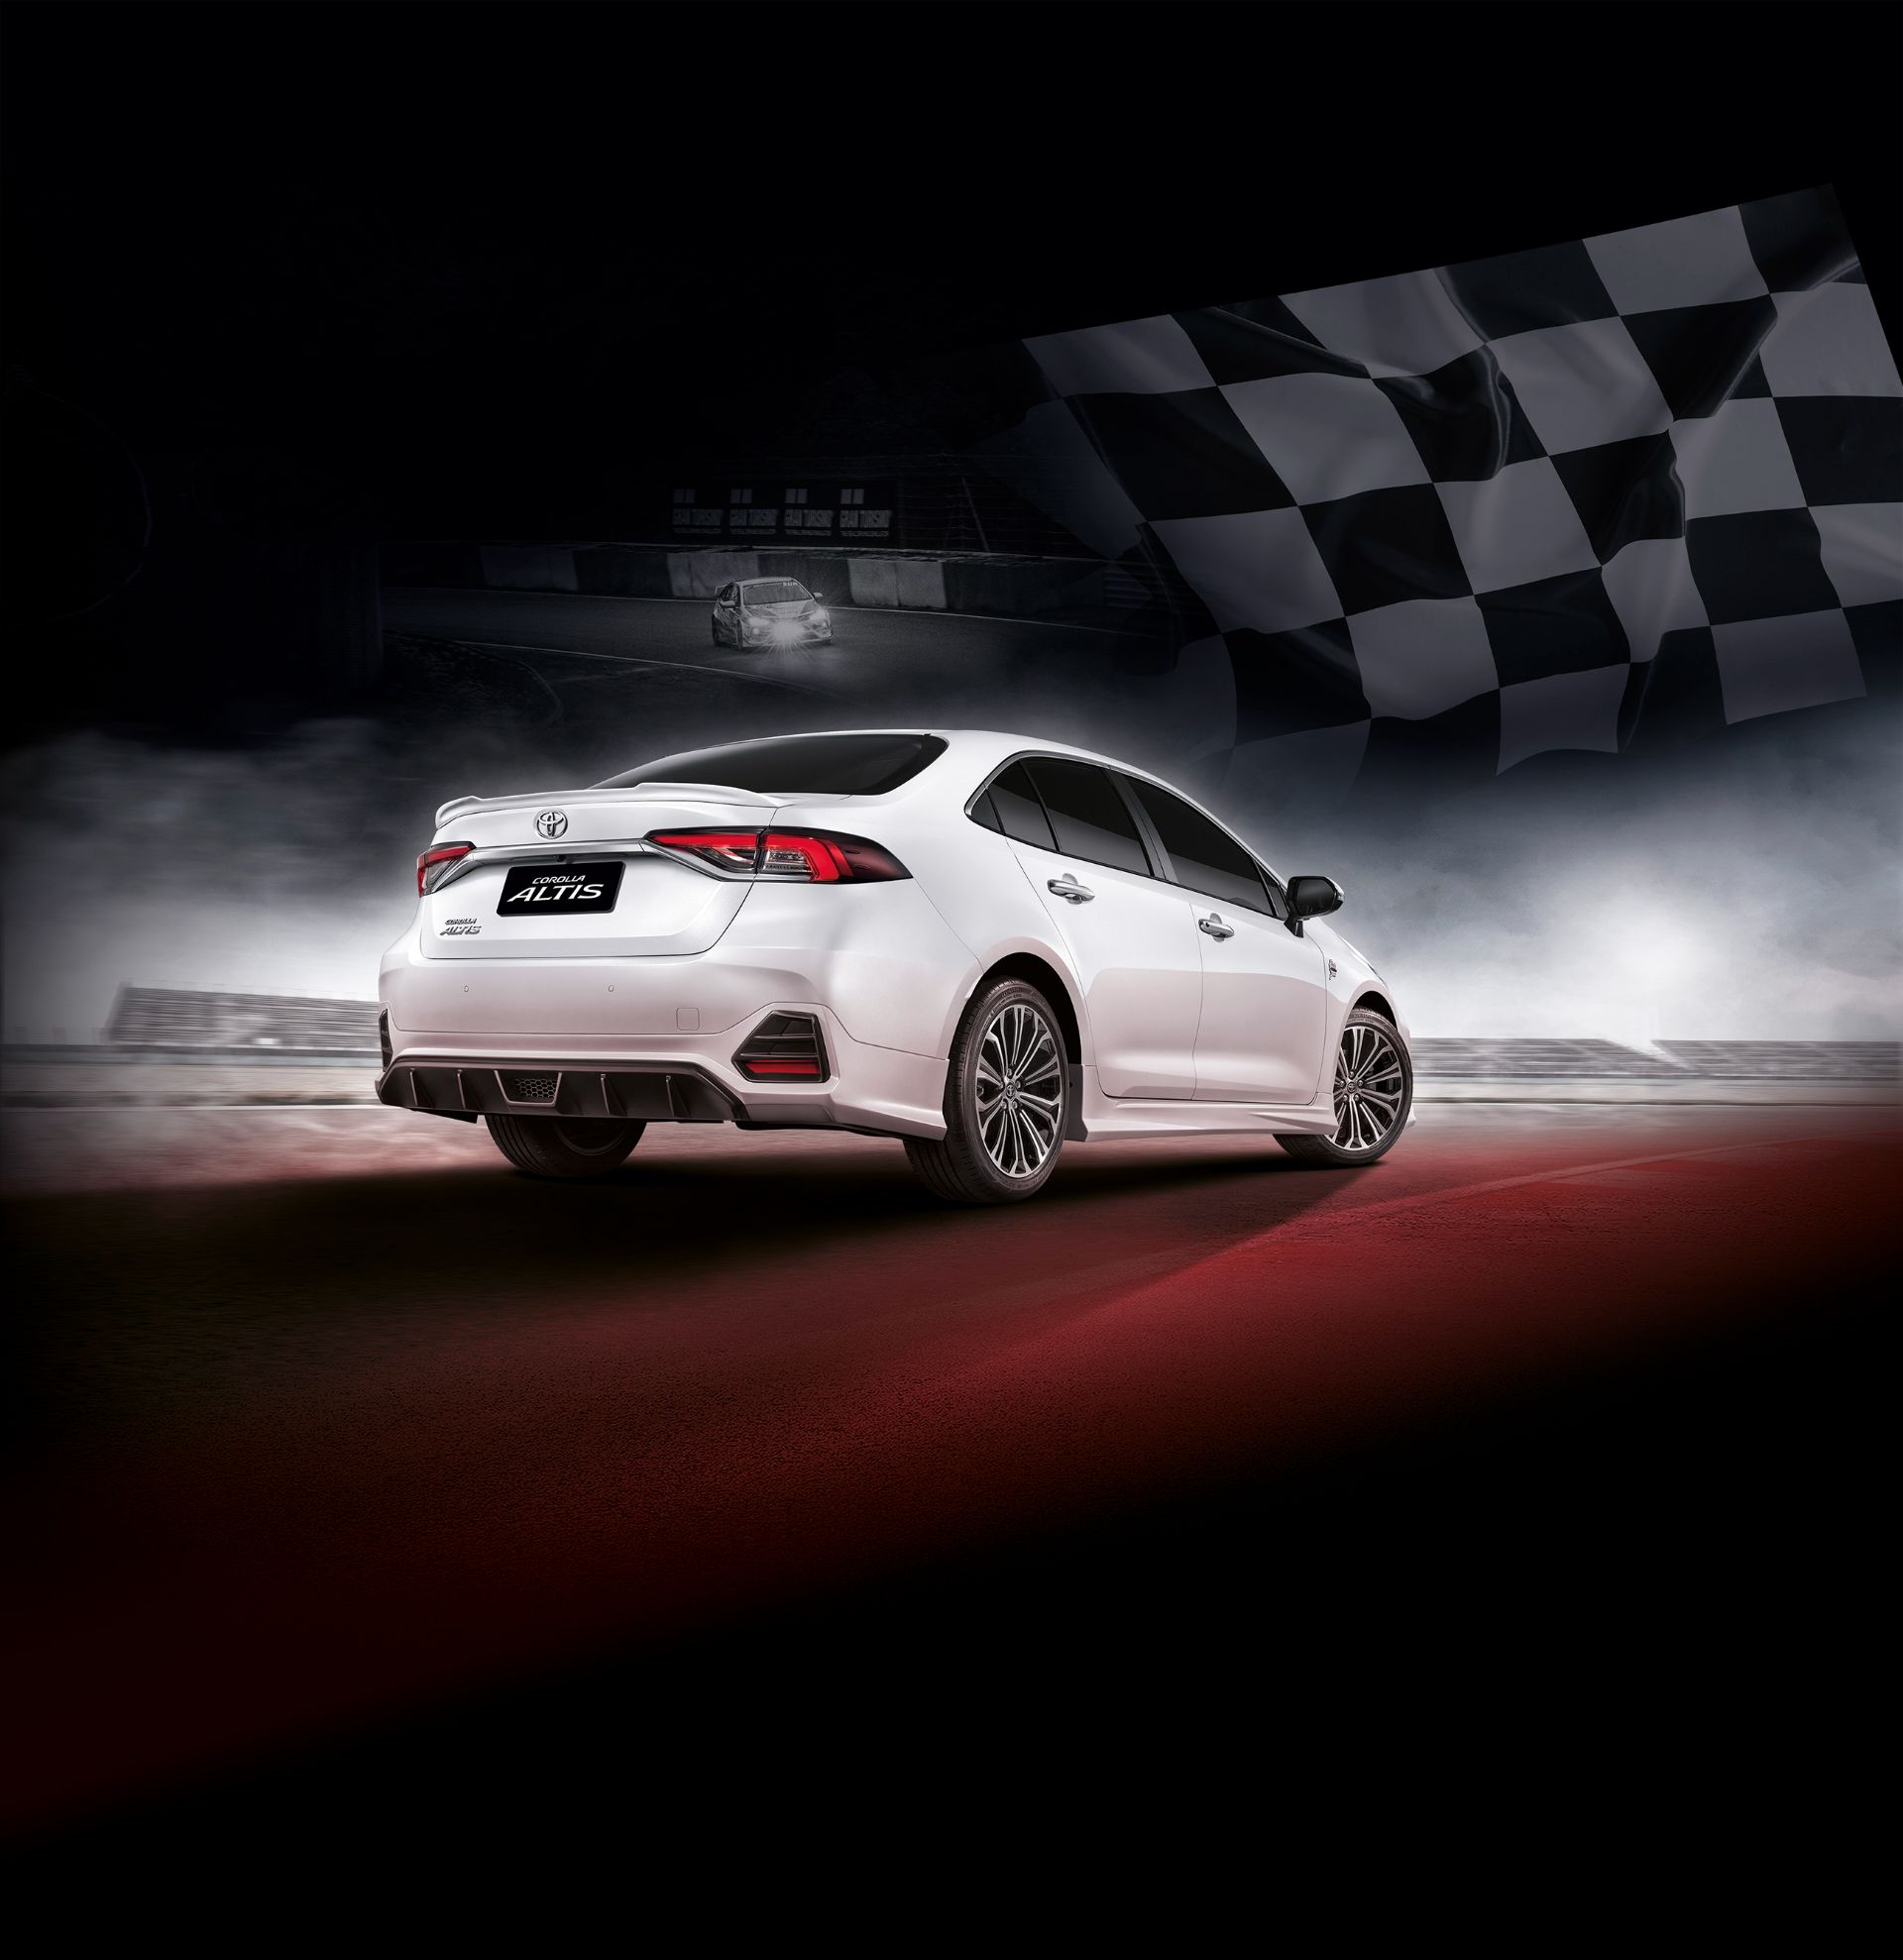 Toyota-Corolla-Altis-Nurburgring-Edition-4